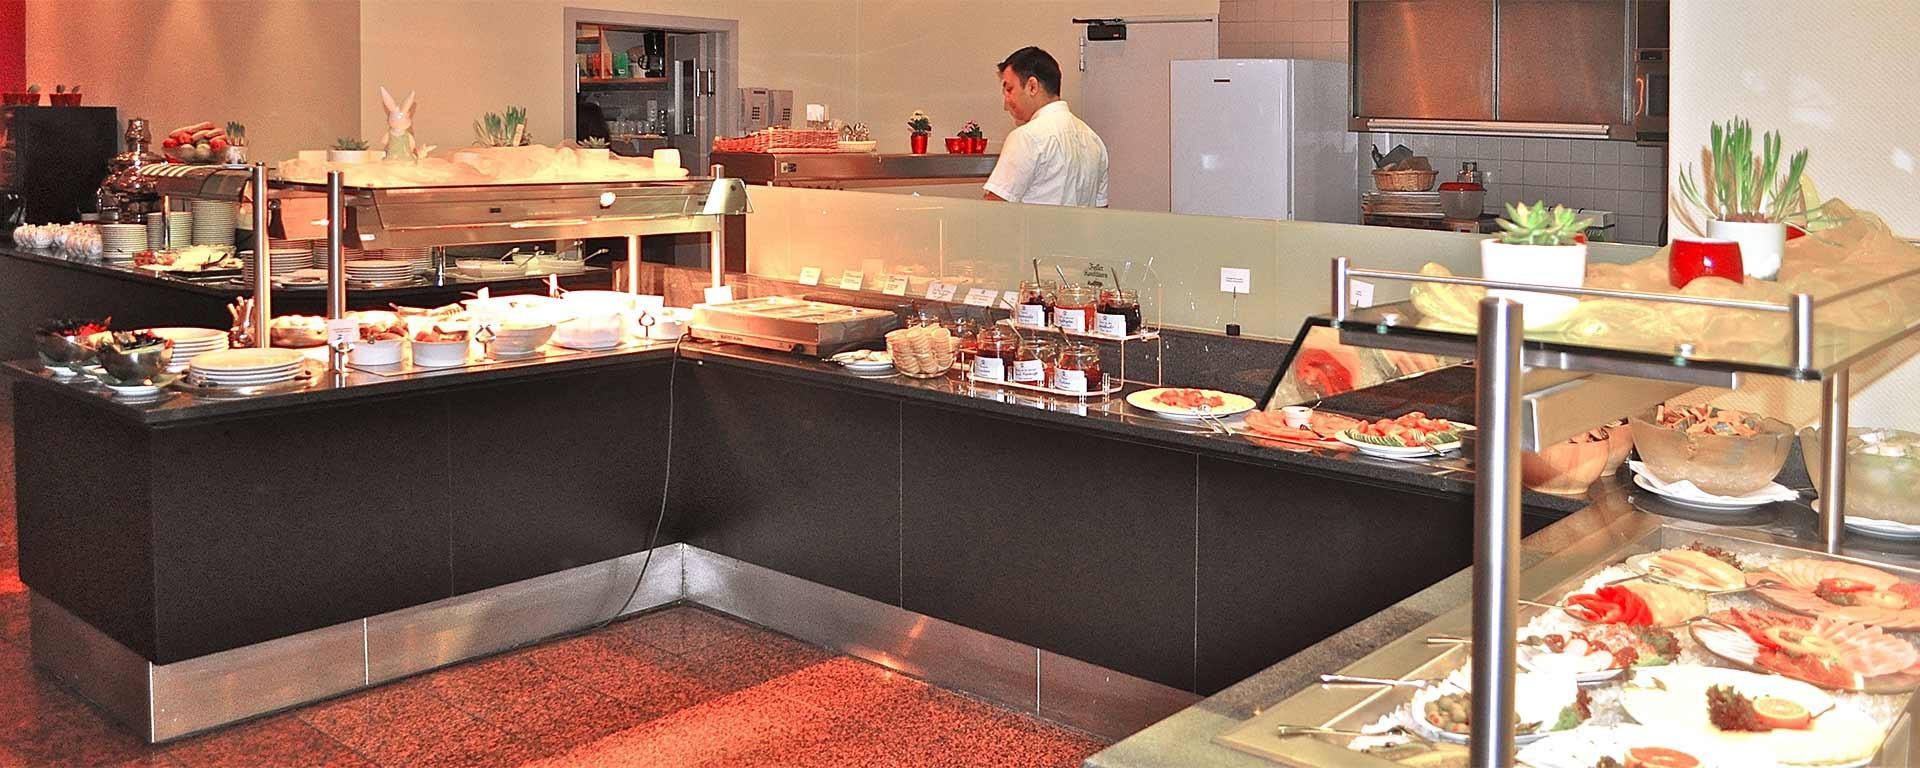 Das Frühstücks-Buffet im SAVOY Hotel Frankfurt